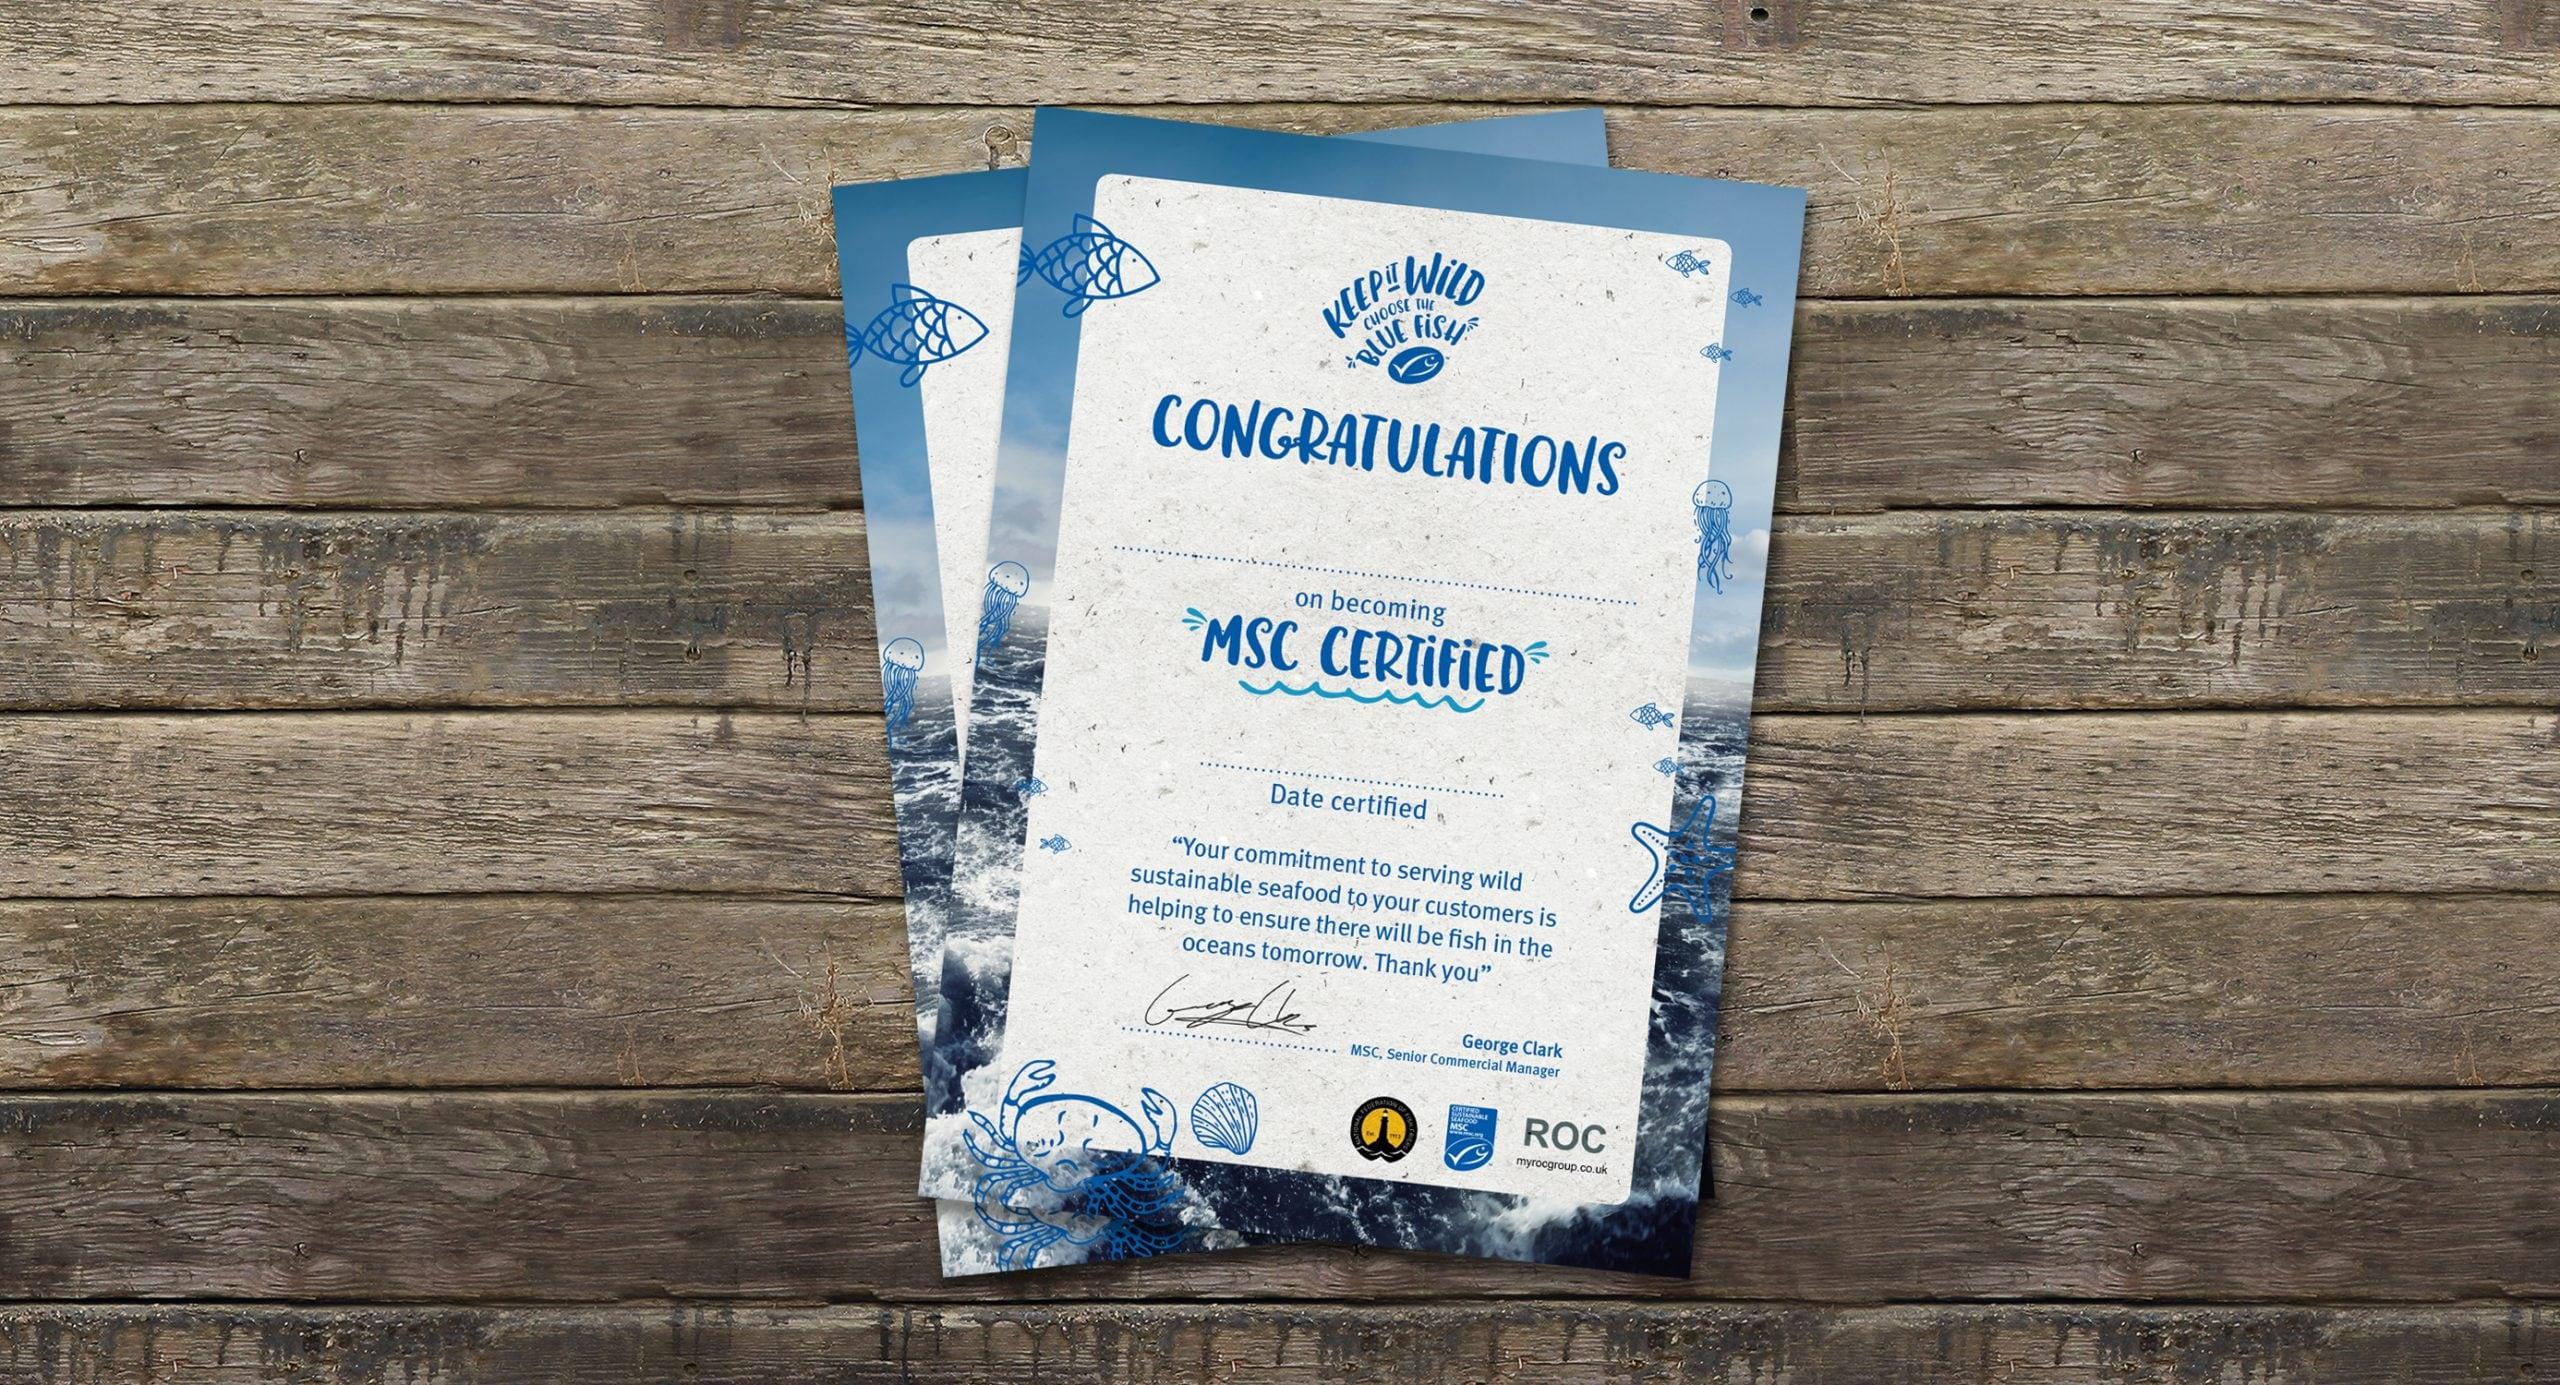 MSC anniversary – Certificate